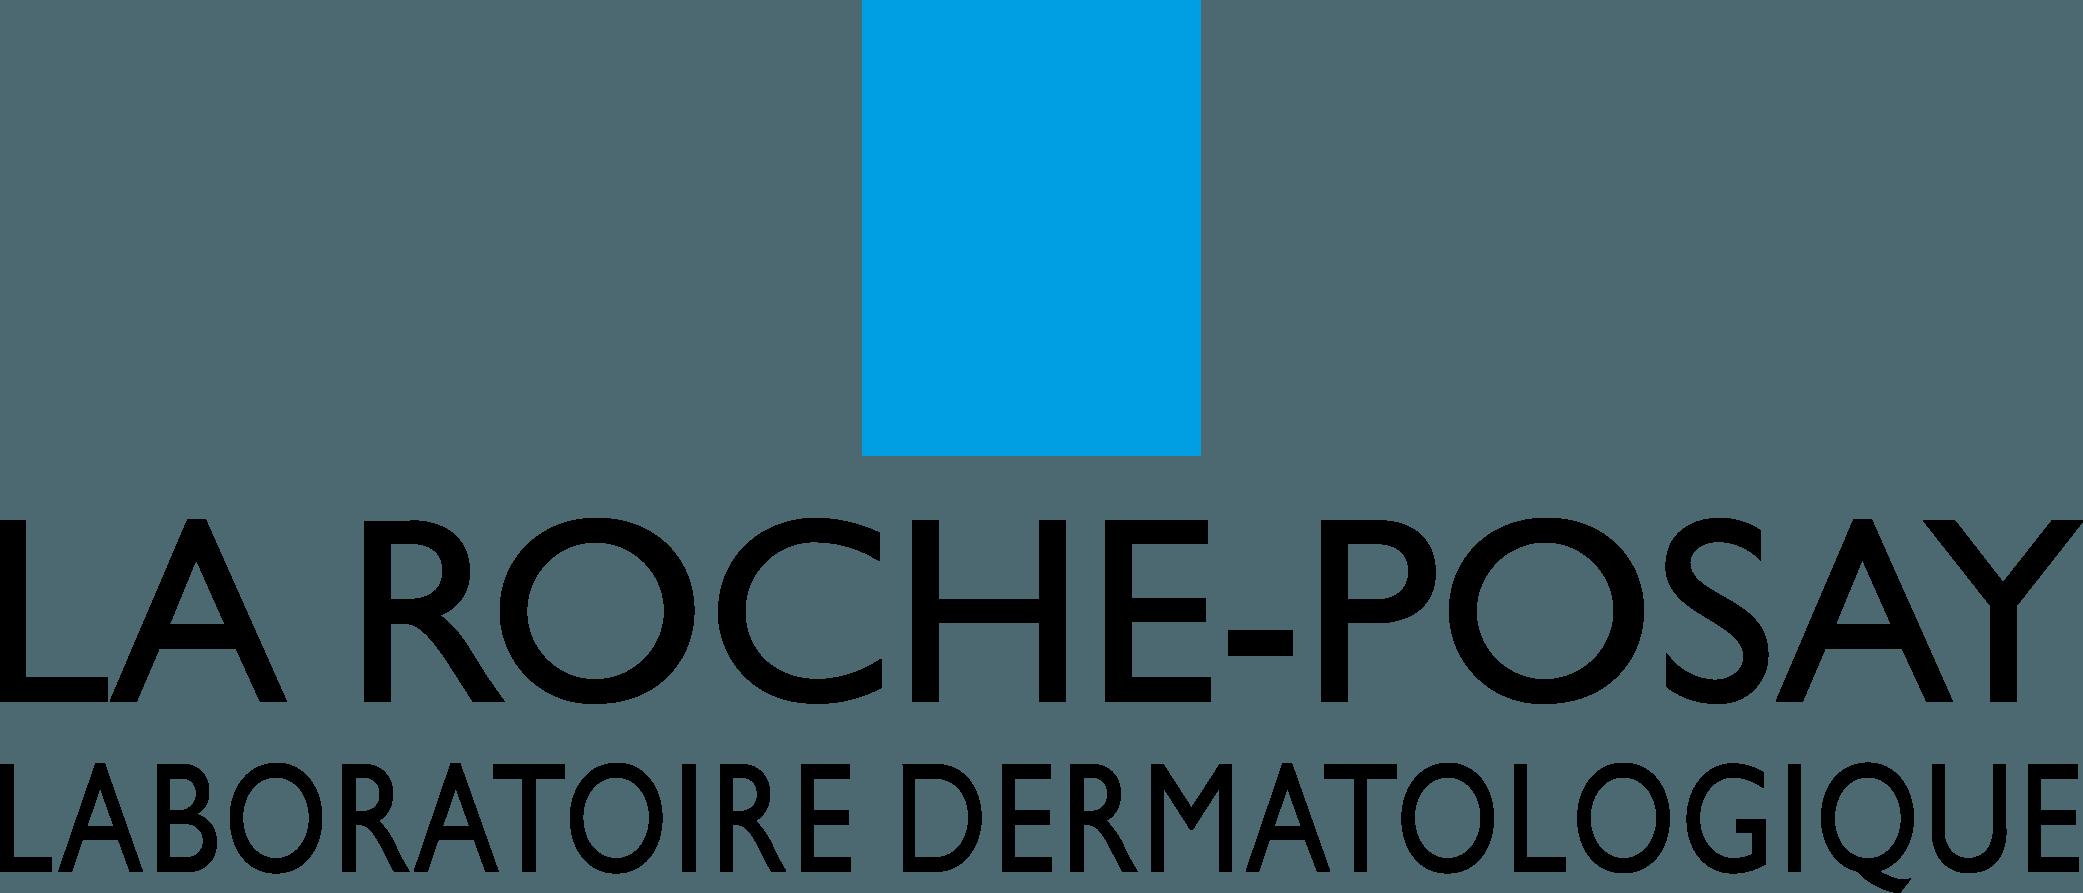 11-la-roche-posay-ascqpharma